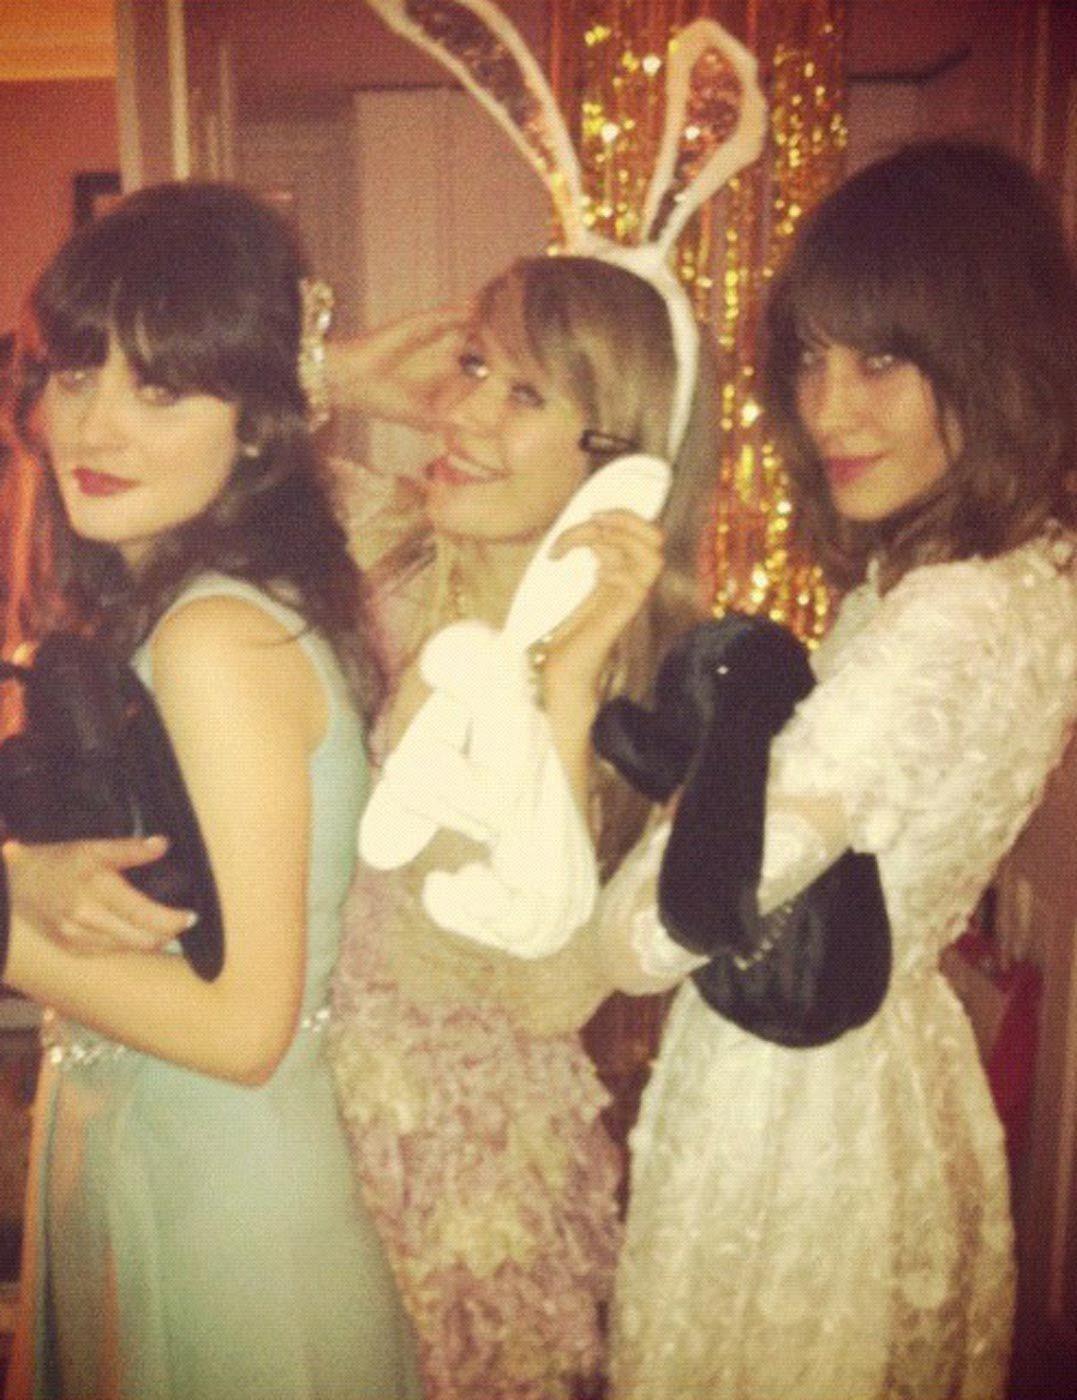 Celebrity Twitpics of the Year - Essence